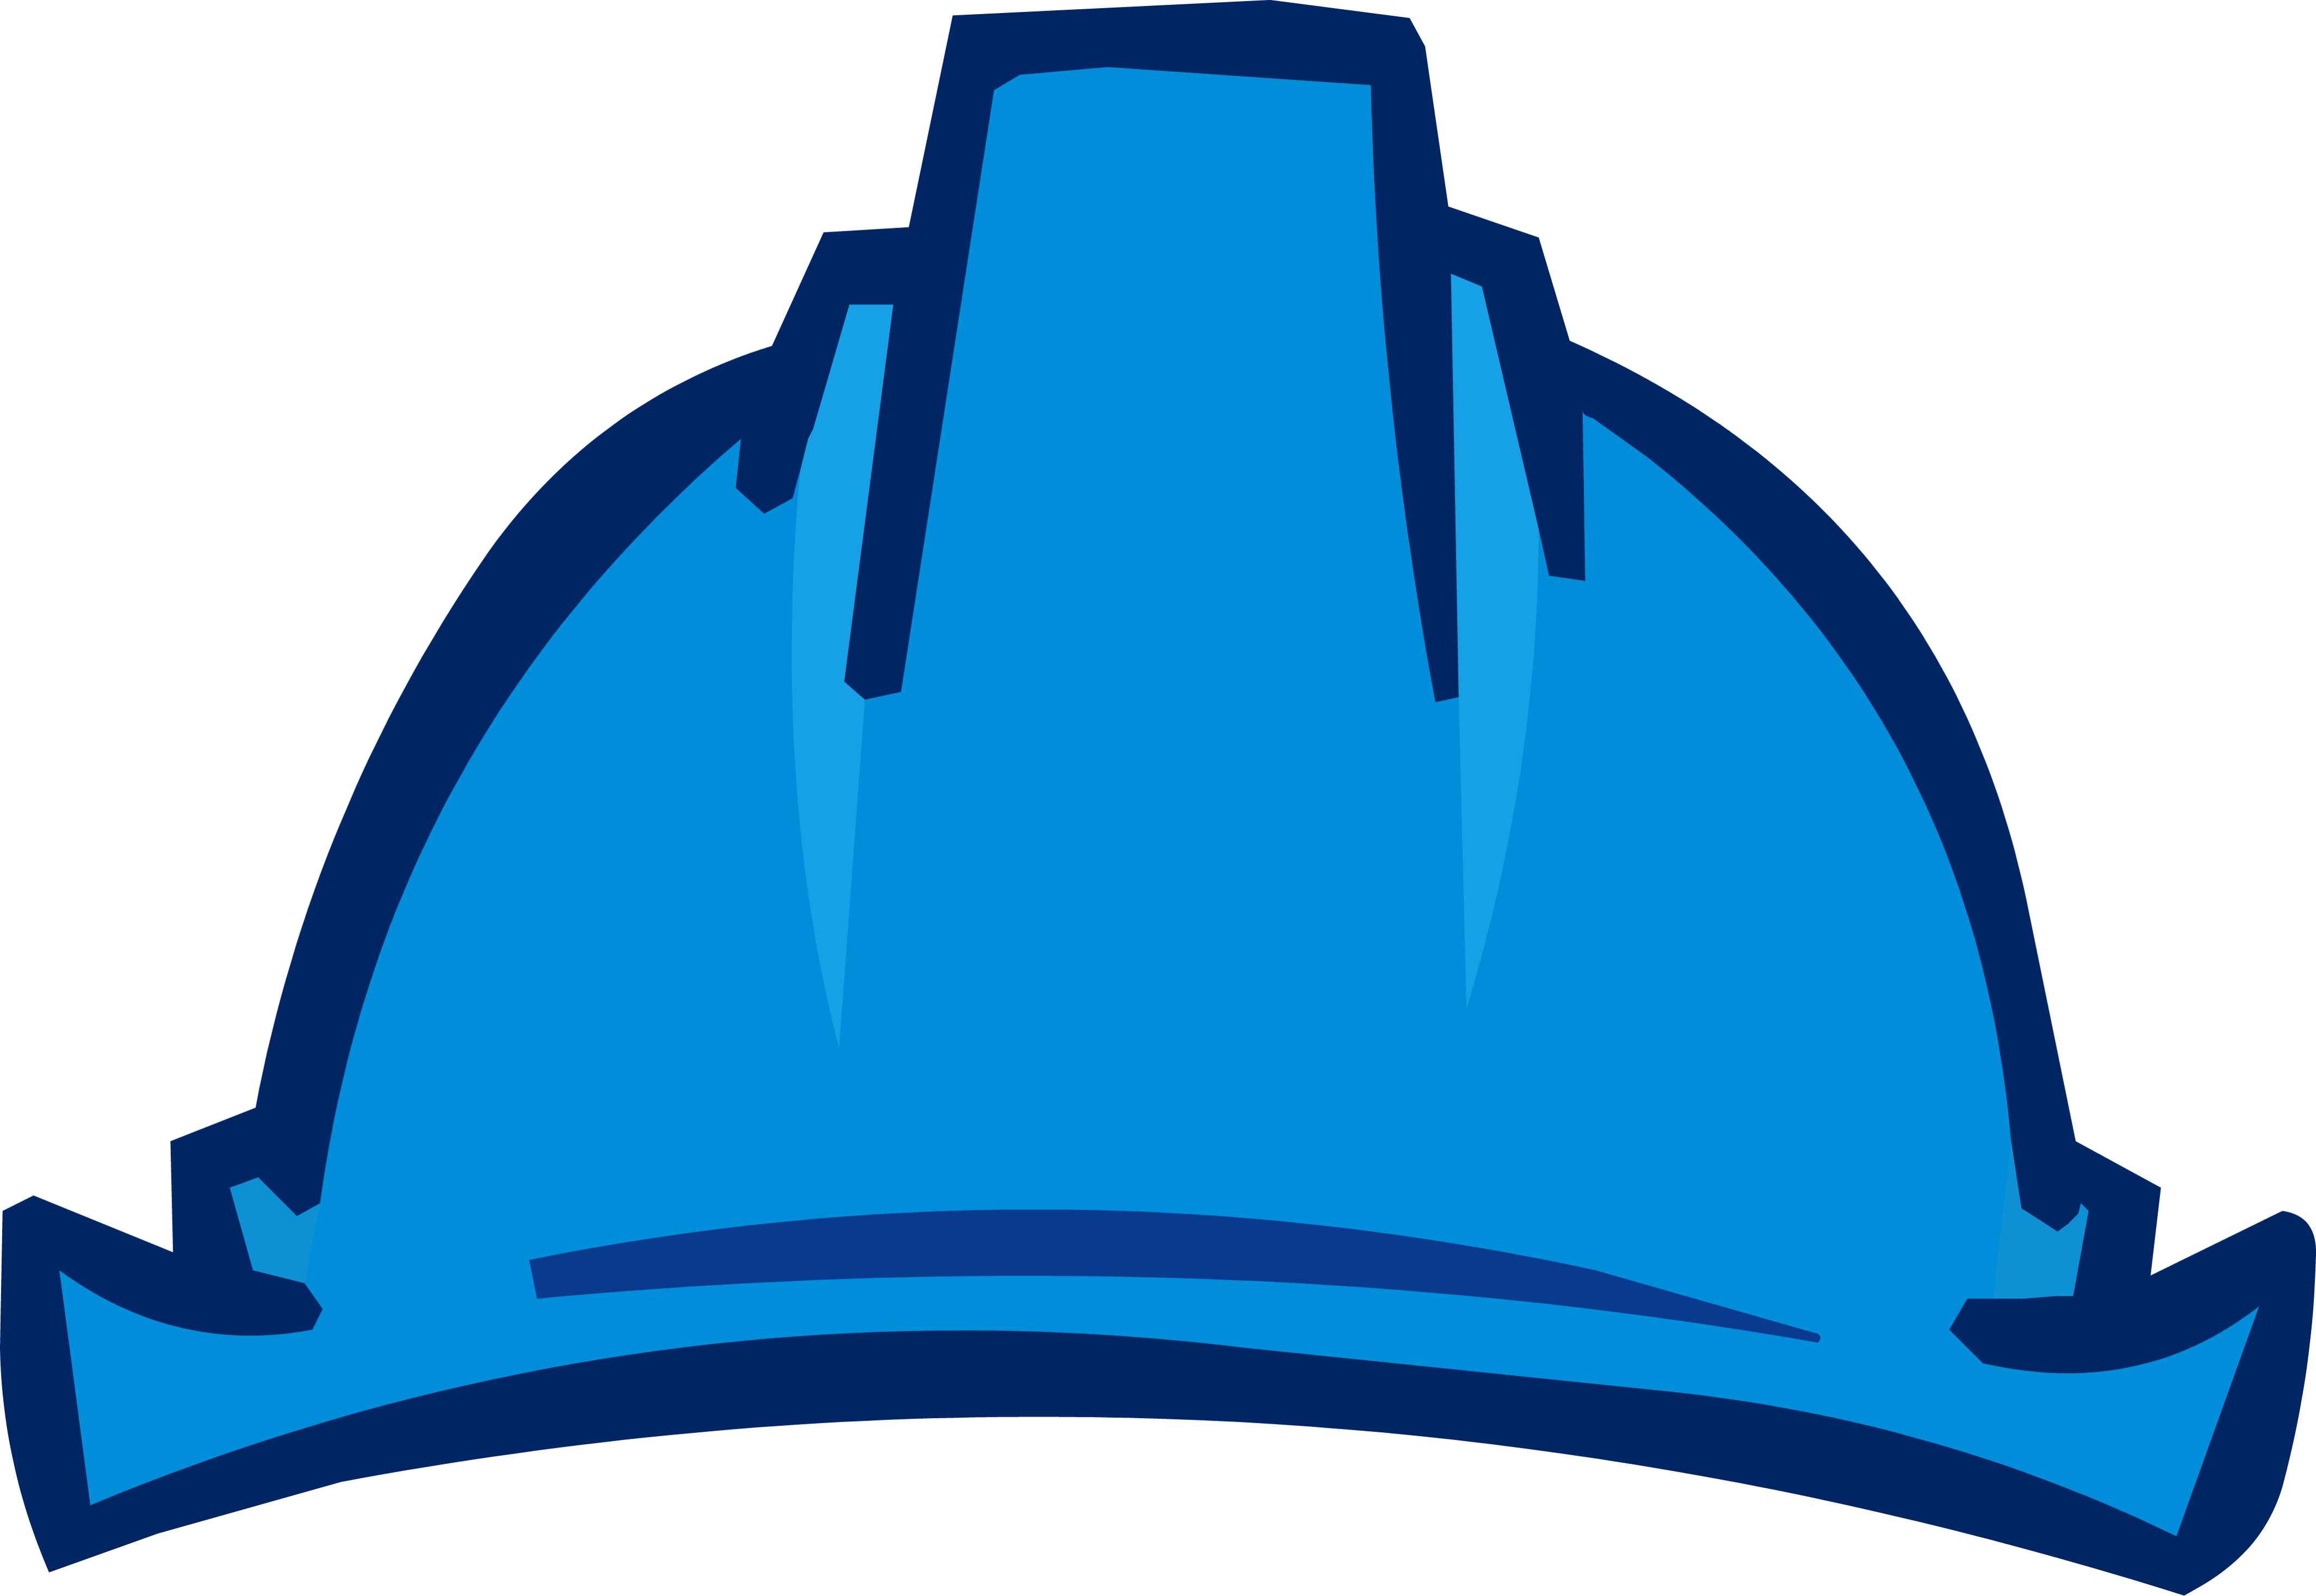 Tipper club penguin wiki. Iceberg clipart deep